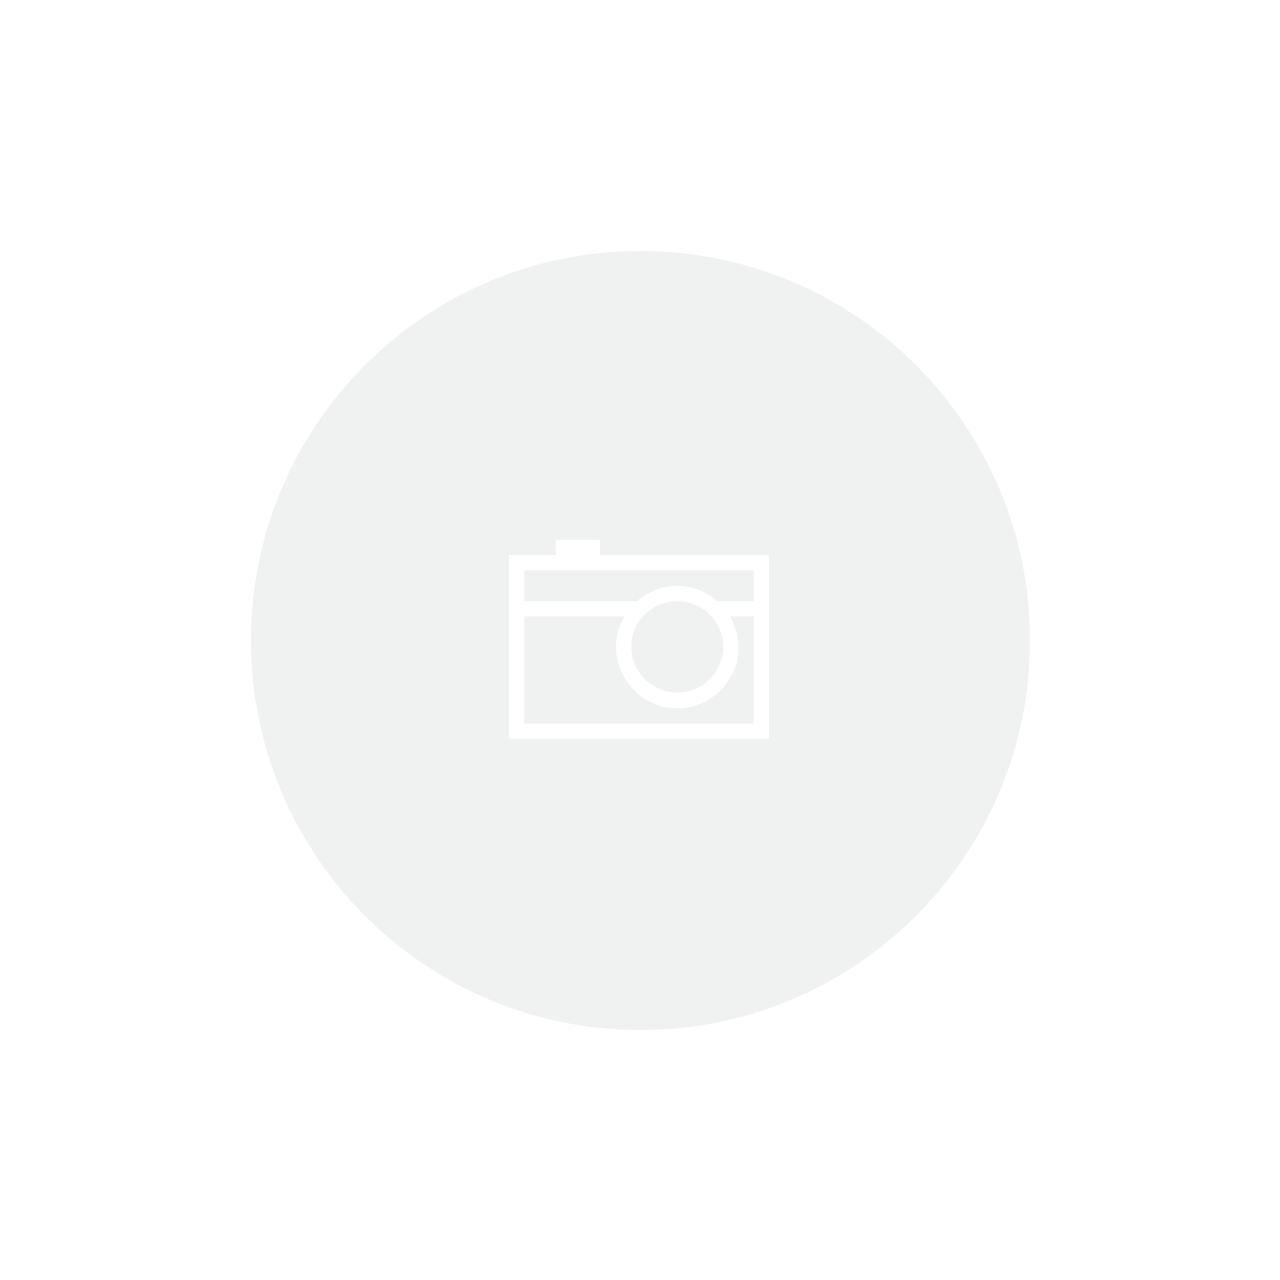 Chinelo Tecido Feminino Beeton Bali F 02